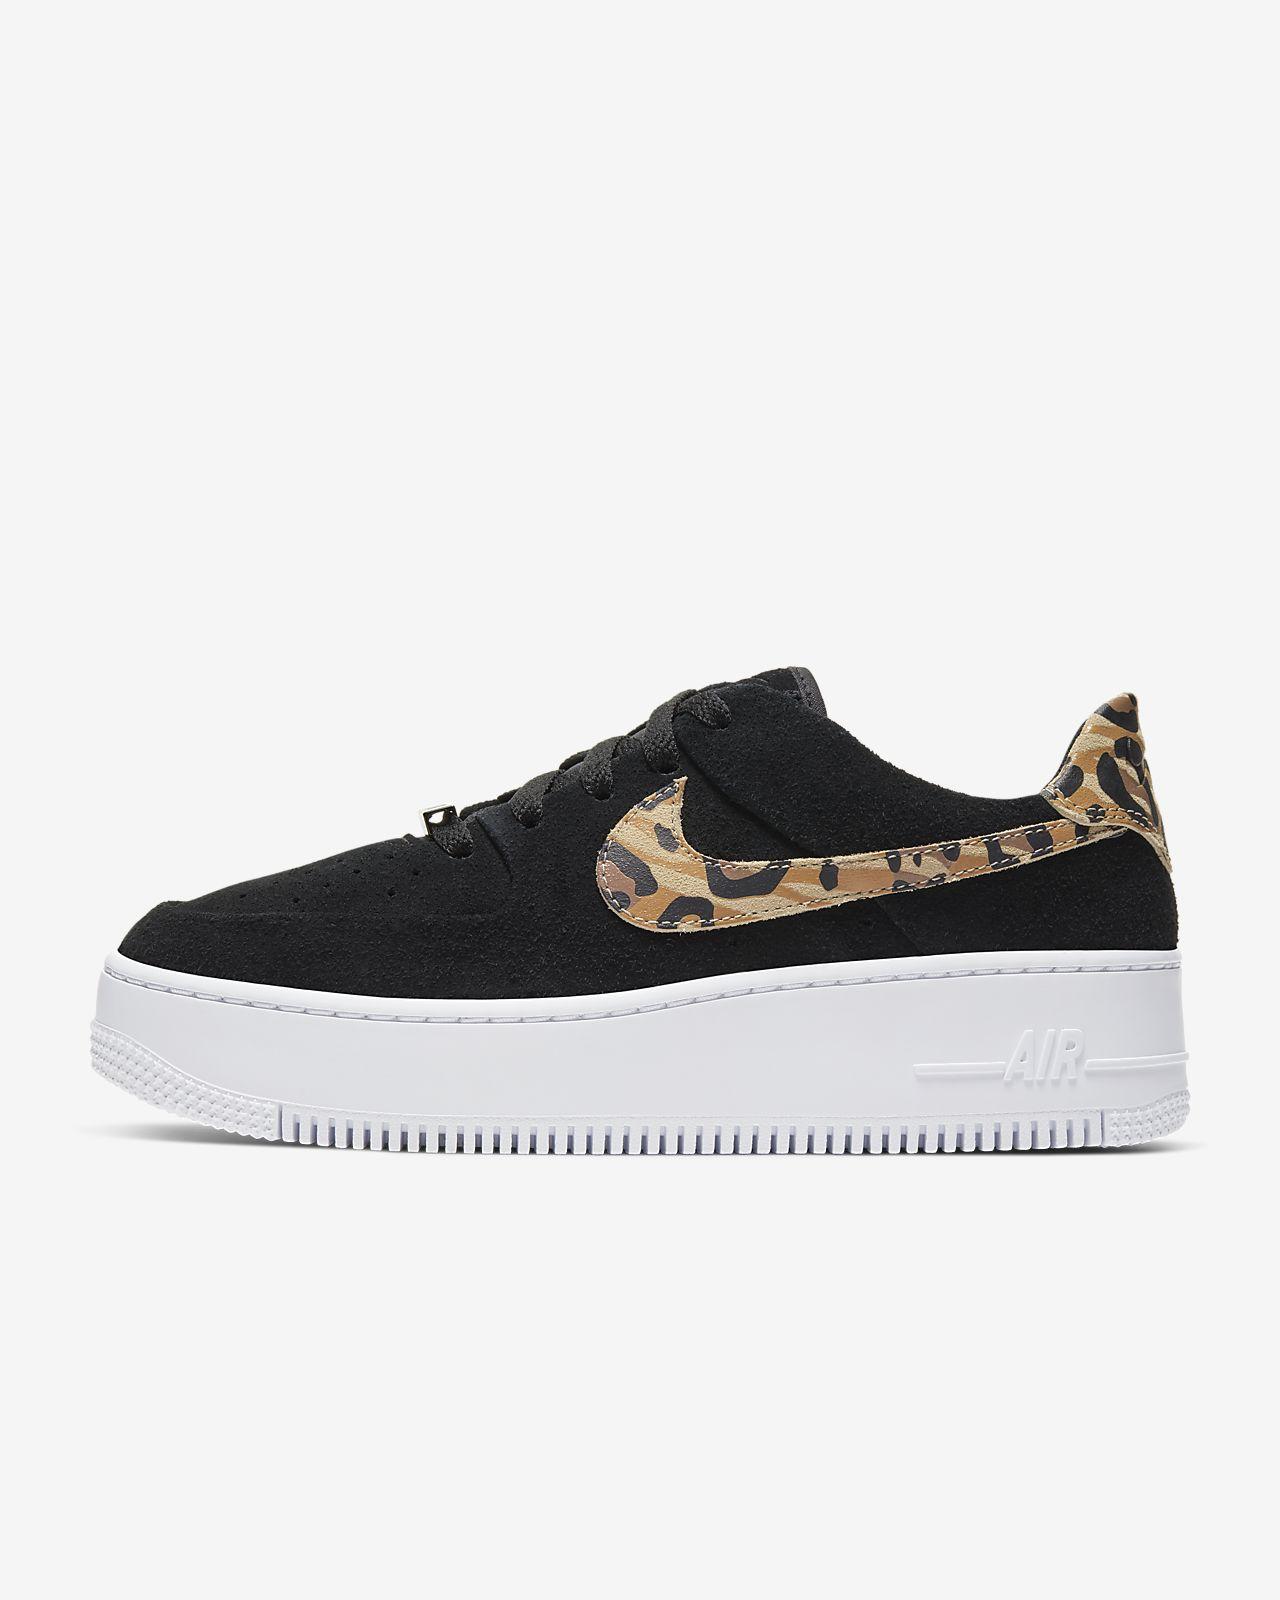 Sapatilhas com estampado animal Nike Air Force 1 Sage Low para mulher